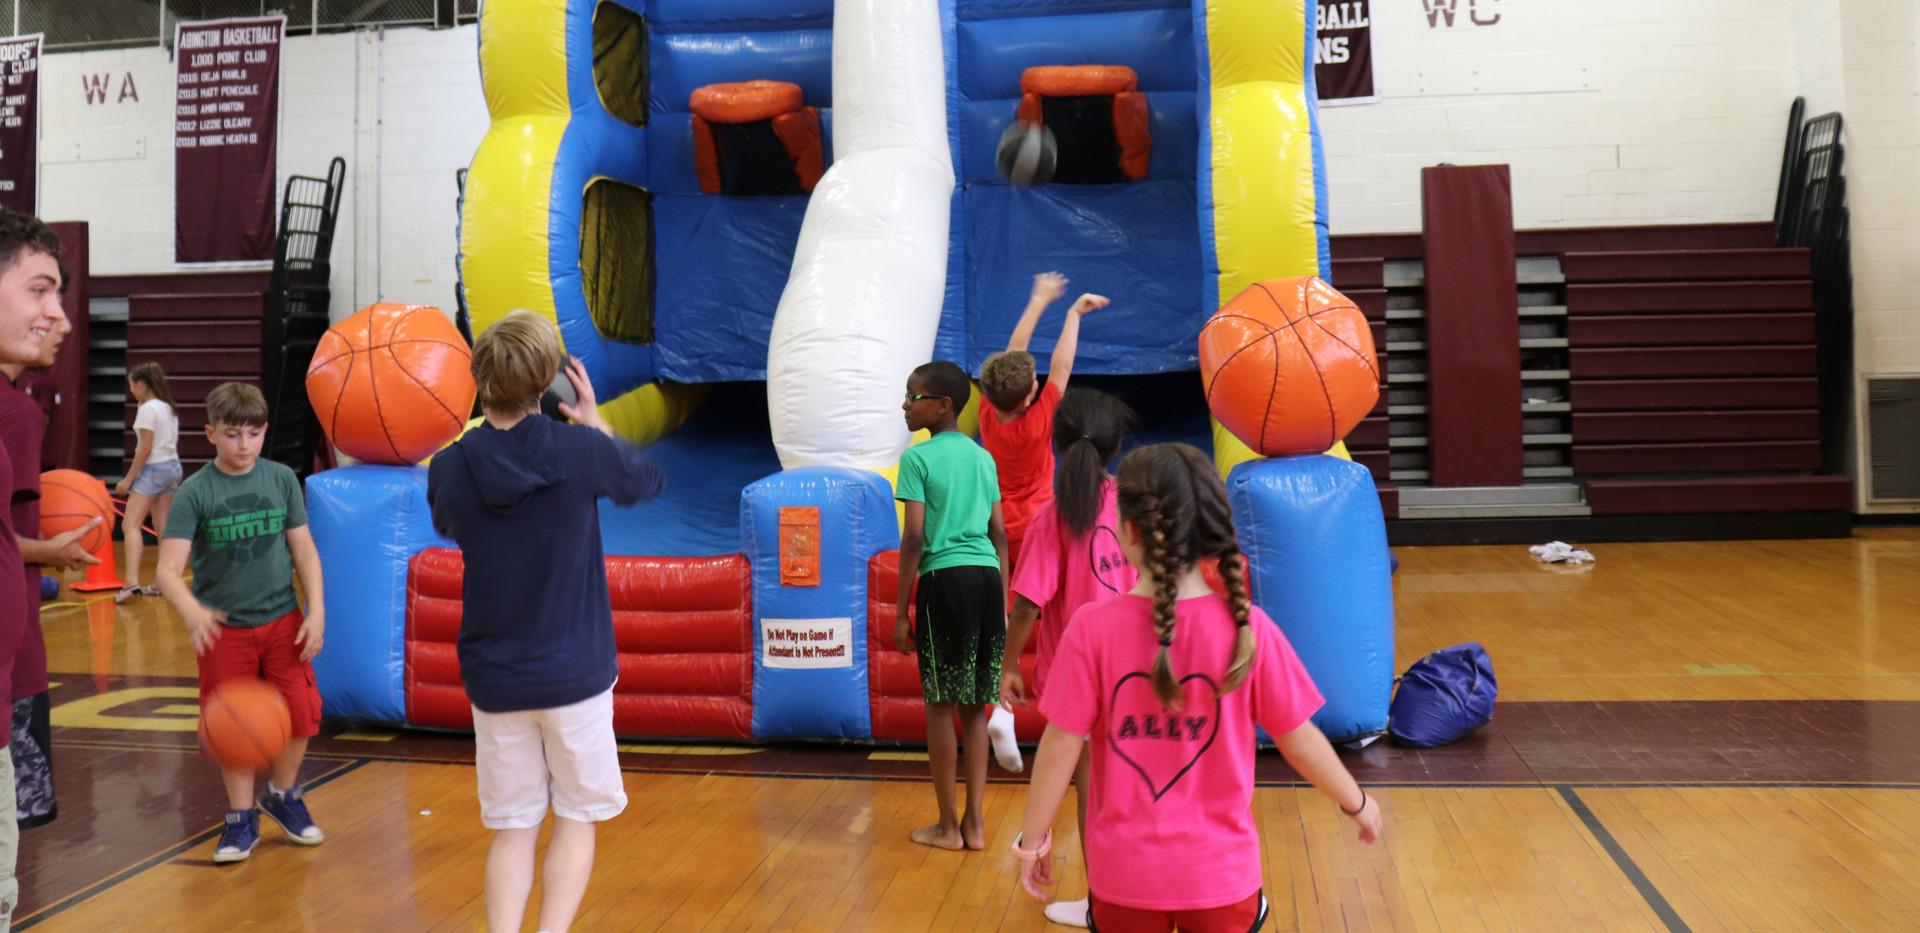 Gym - Inflatables 2.jpg